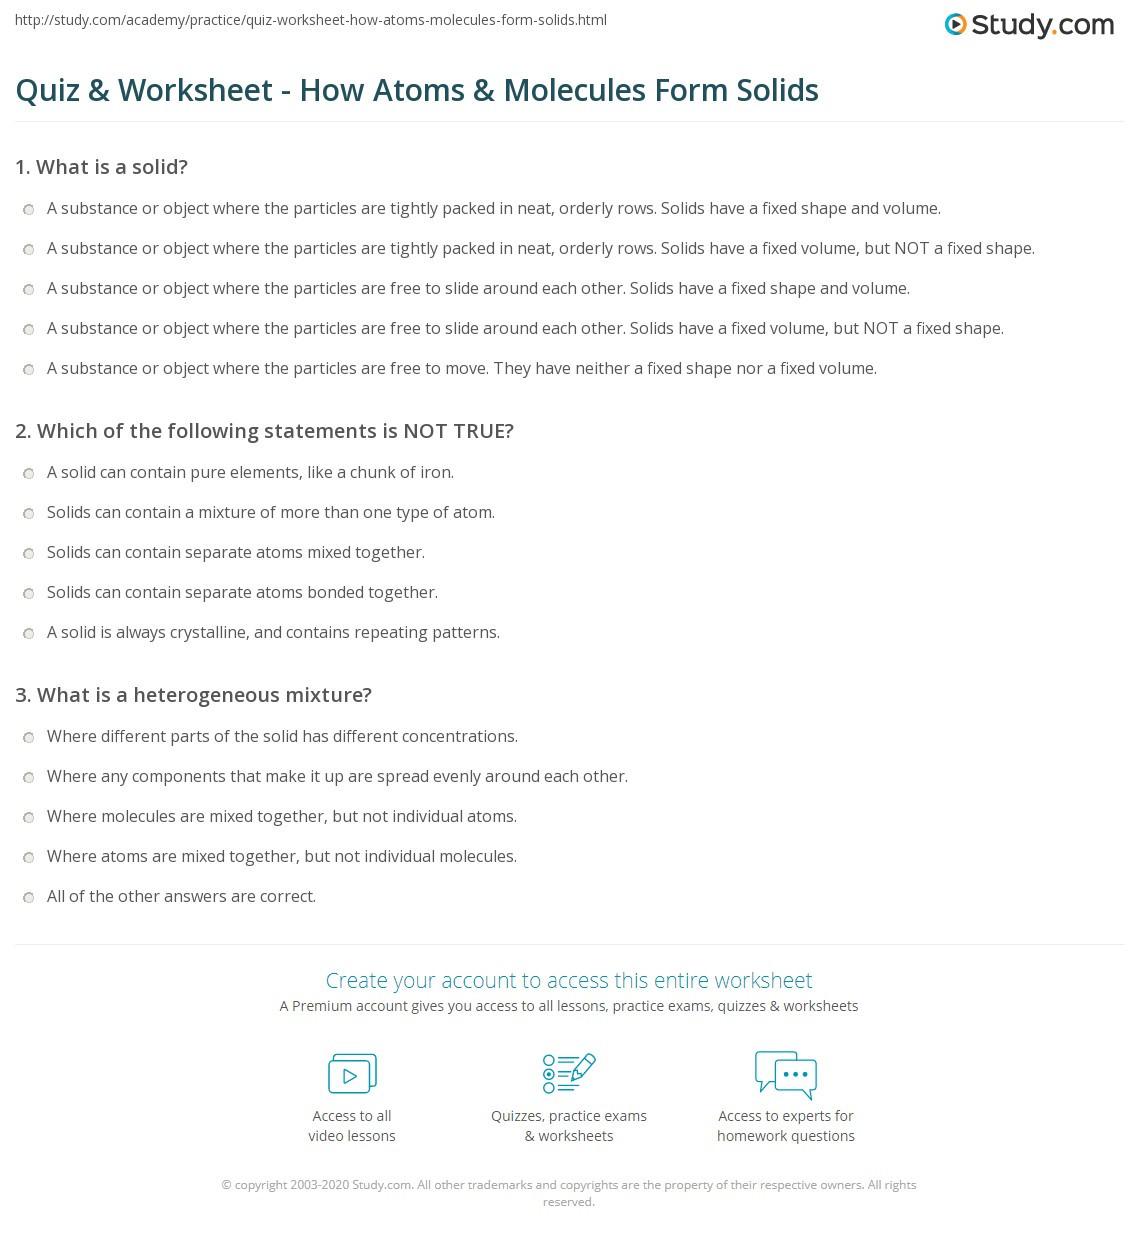 Atoms and Molecules Worksheet Quiz & Worksheet How atoms & Molecules form solids